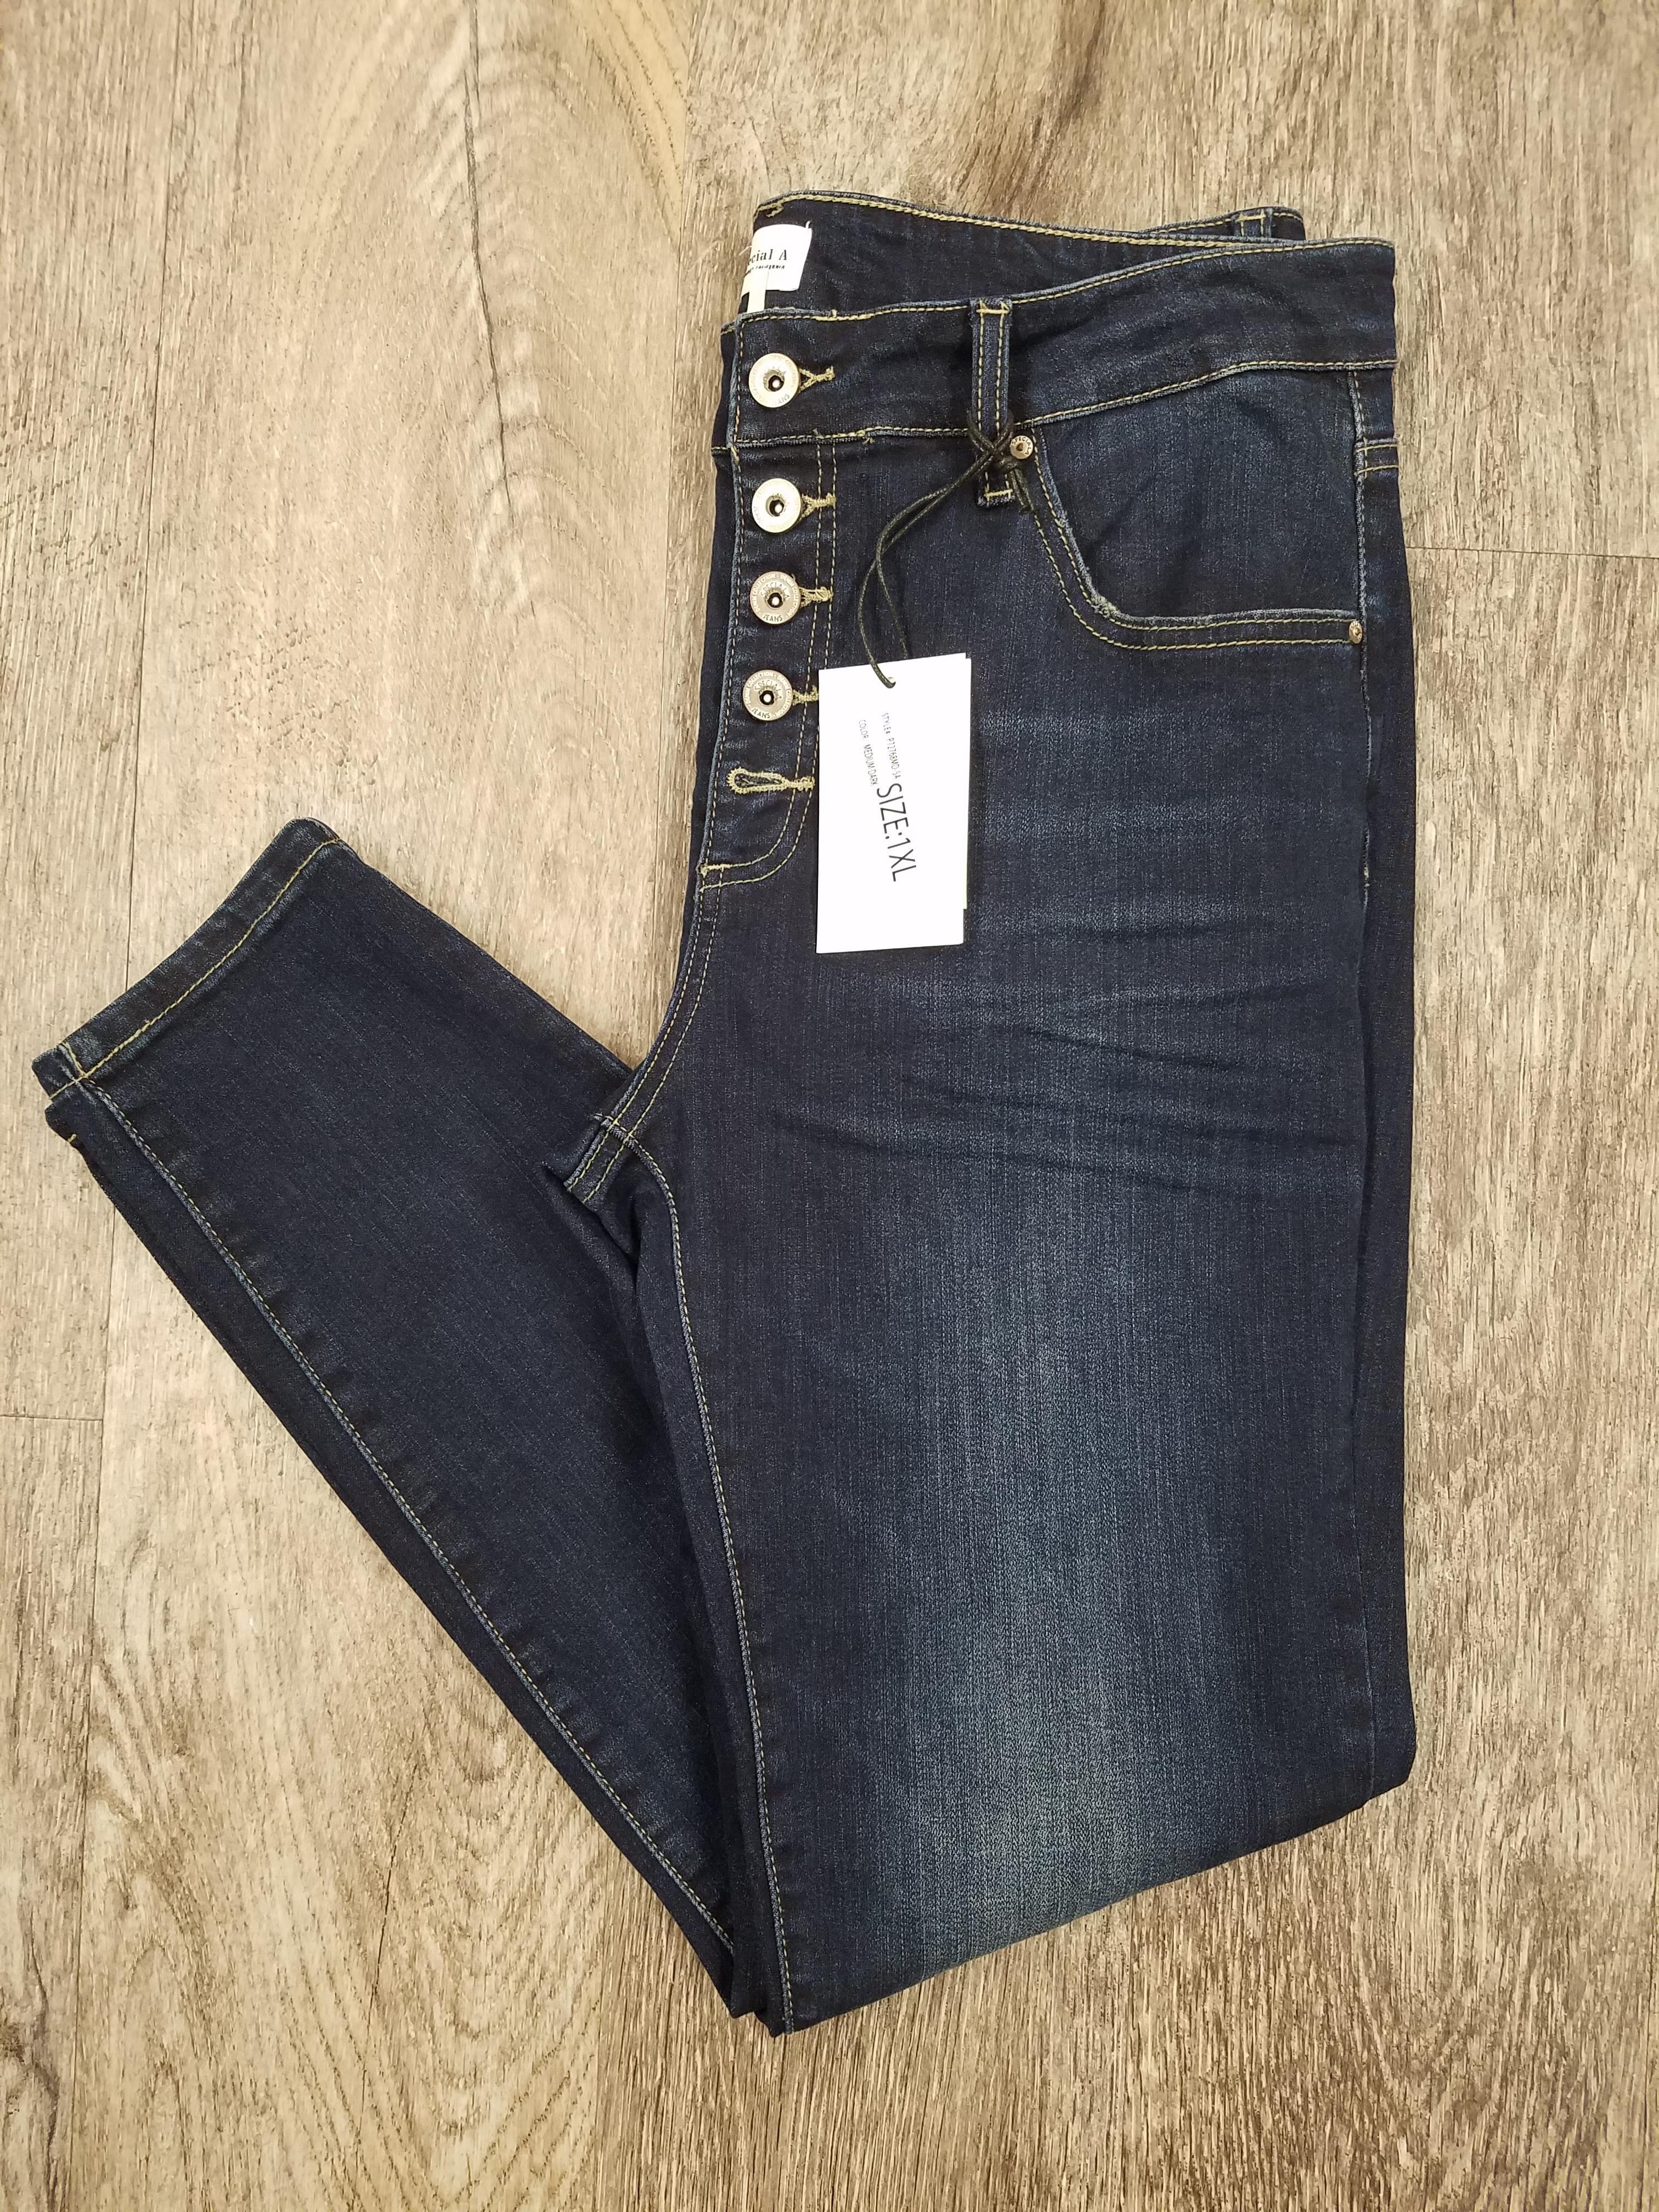 Button Fly Medium Dark Skinny Jeans *Curvy Approved*